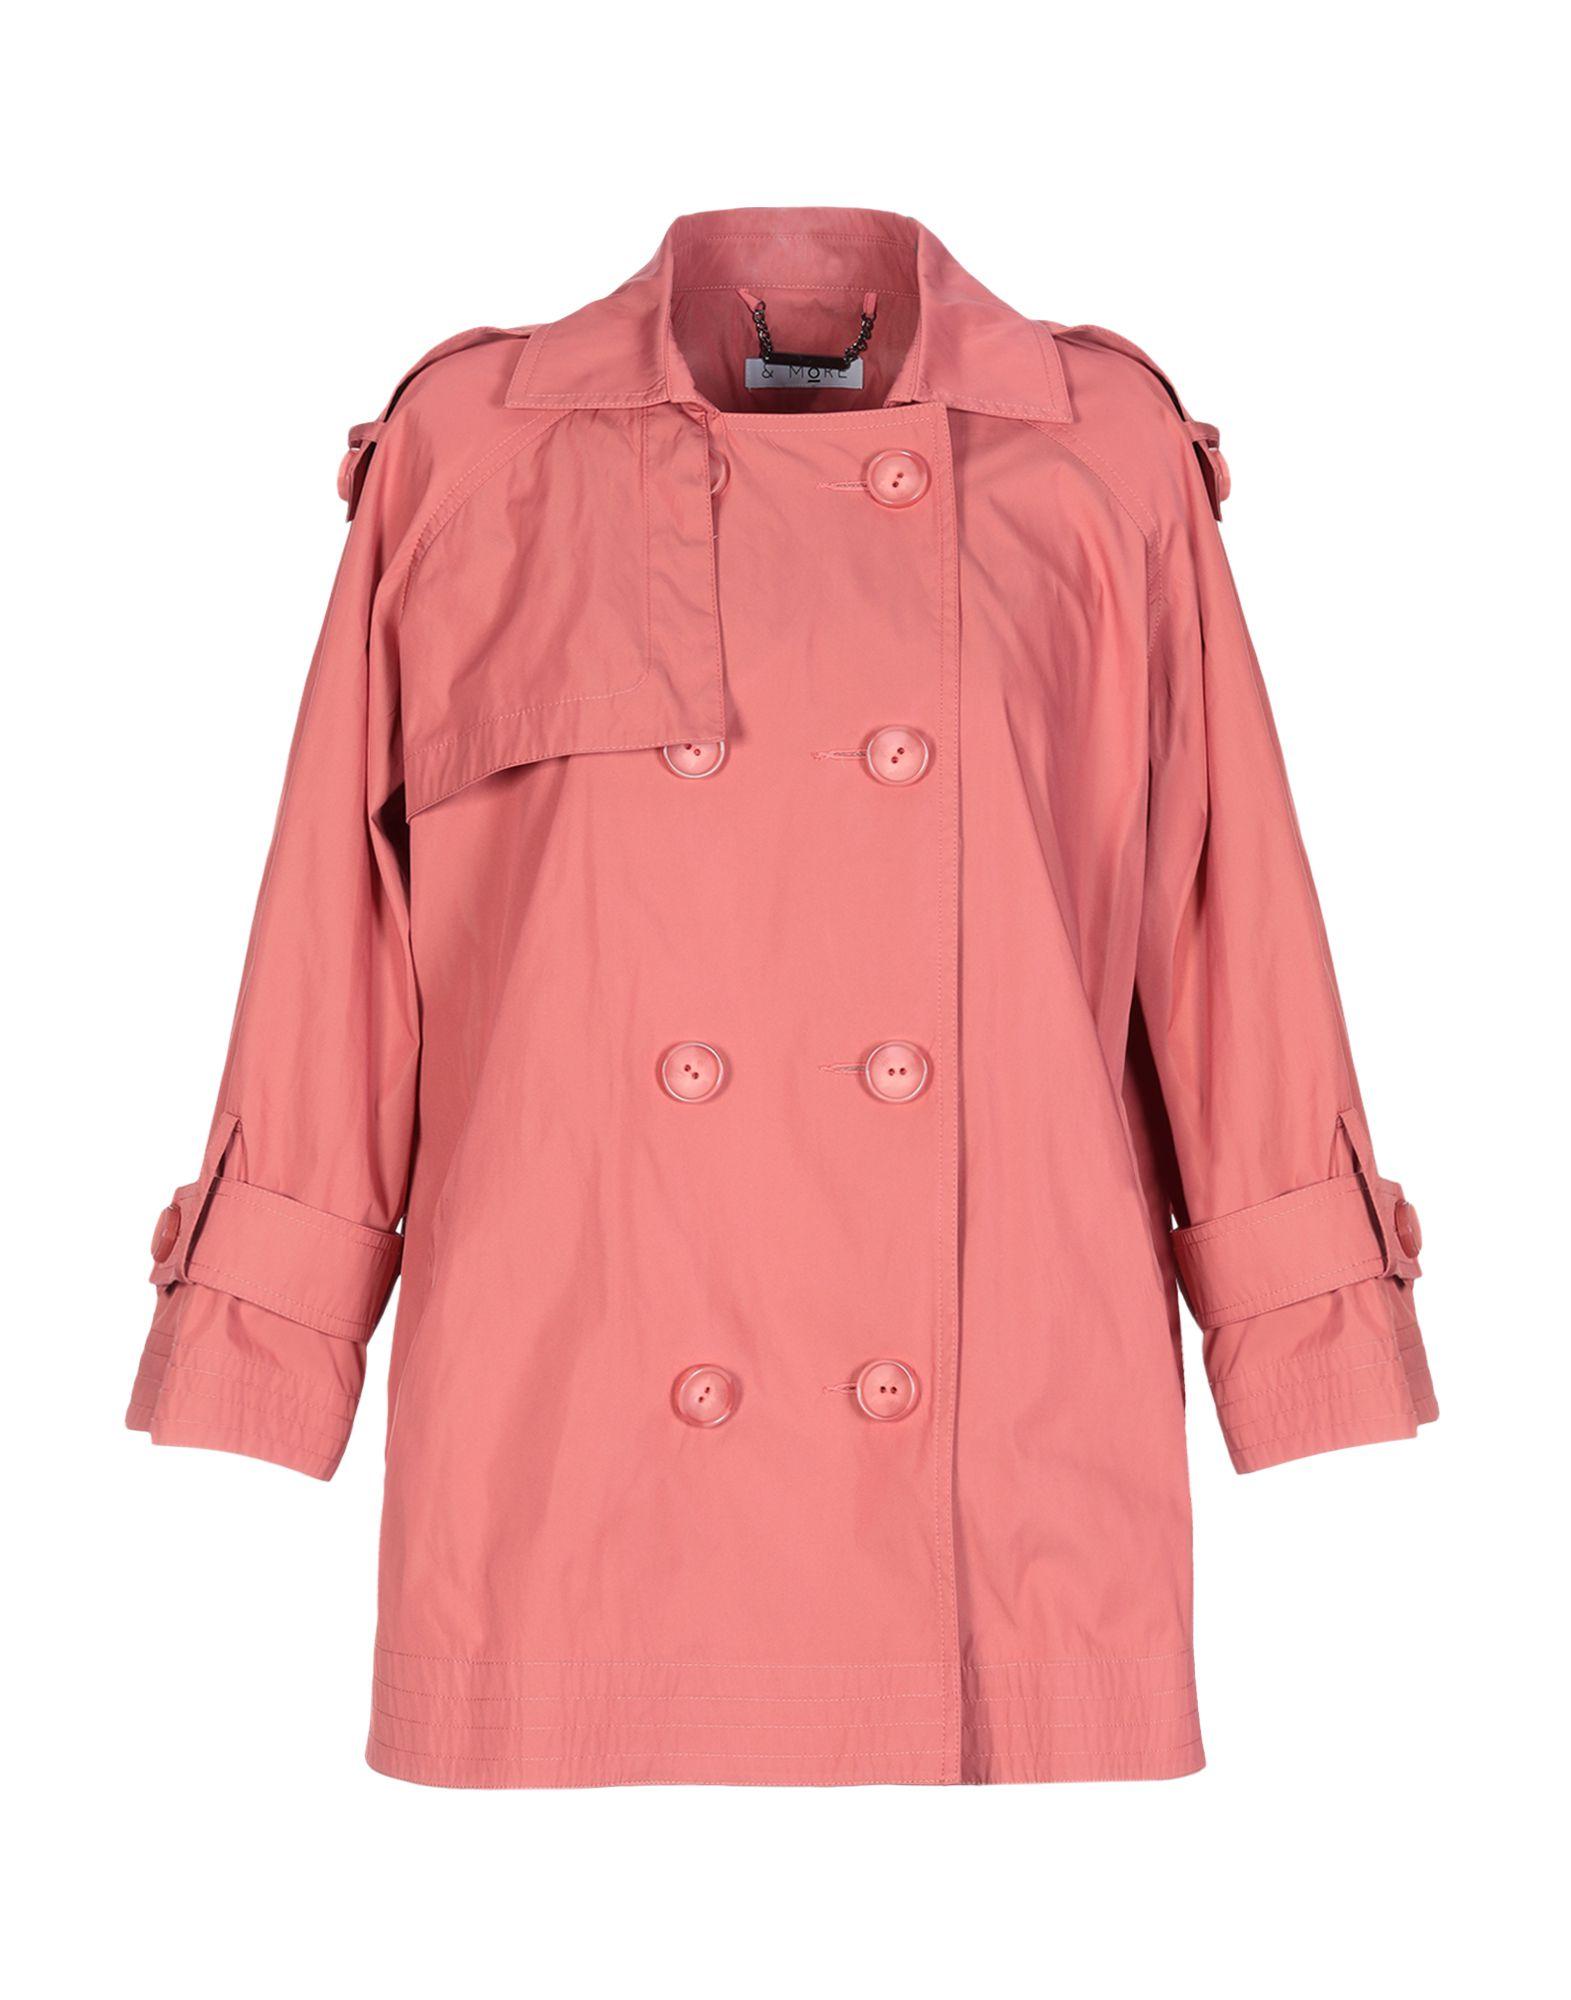 Фото - & MoRE Легкое пальто nous etudions легкое пальто